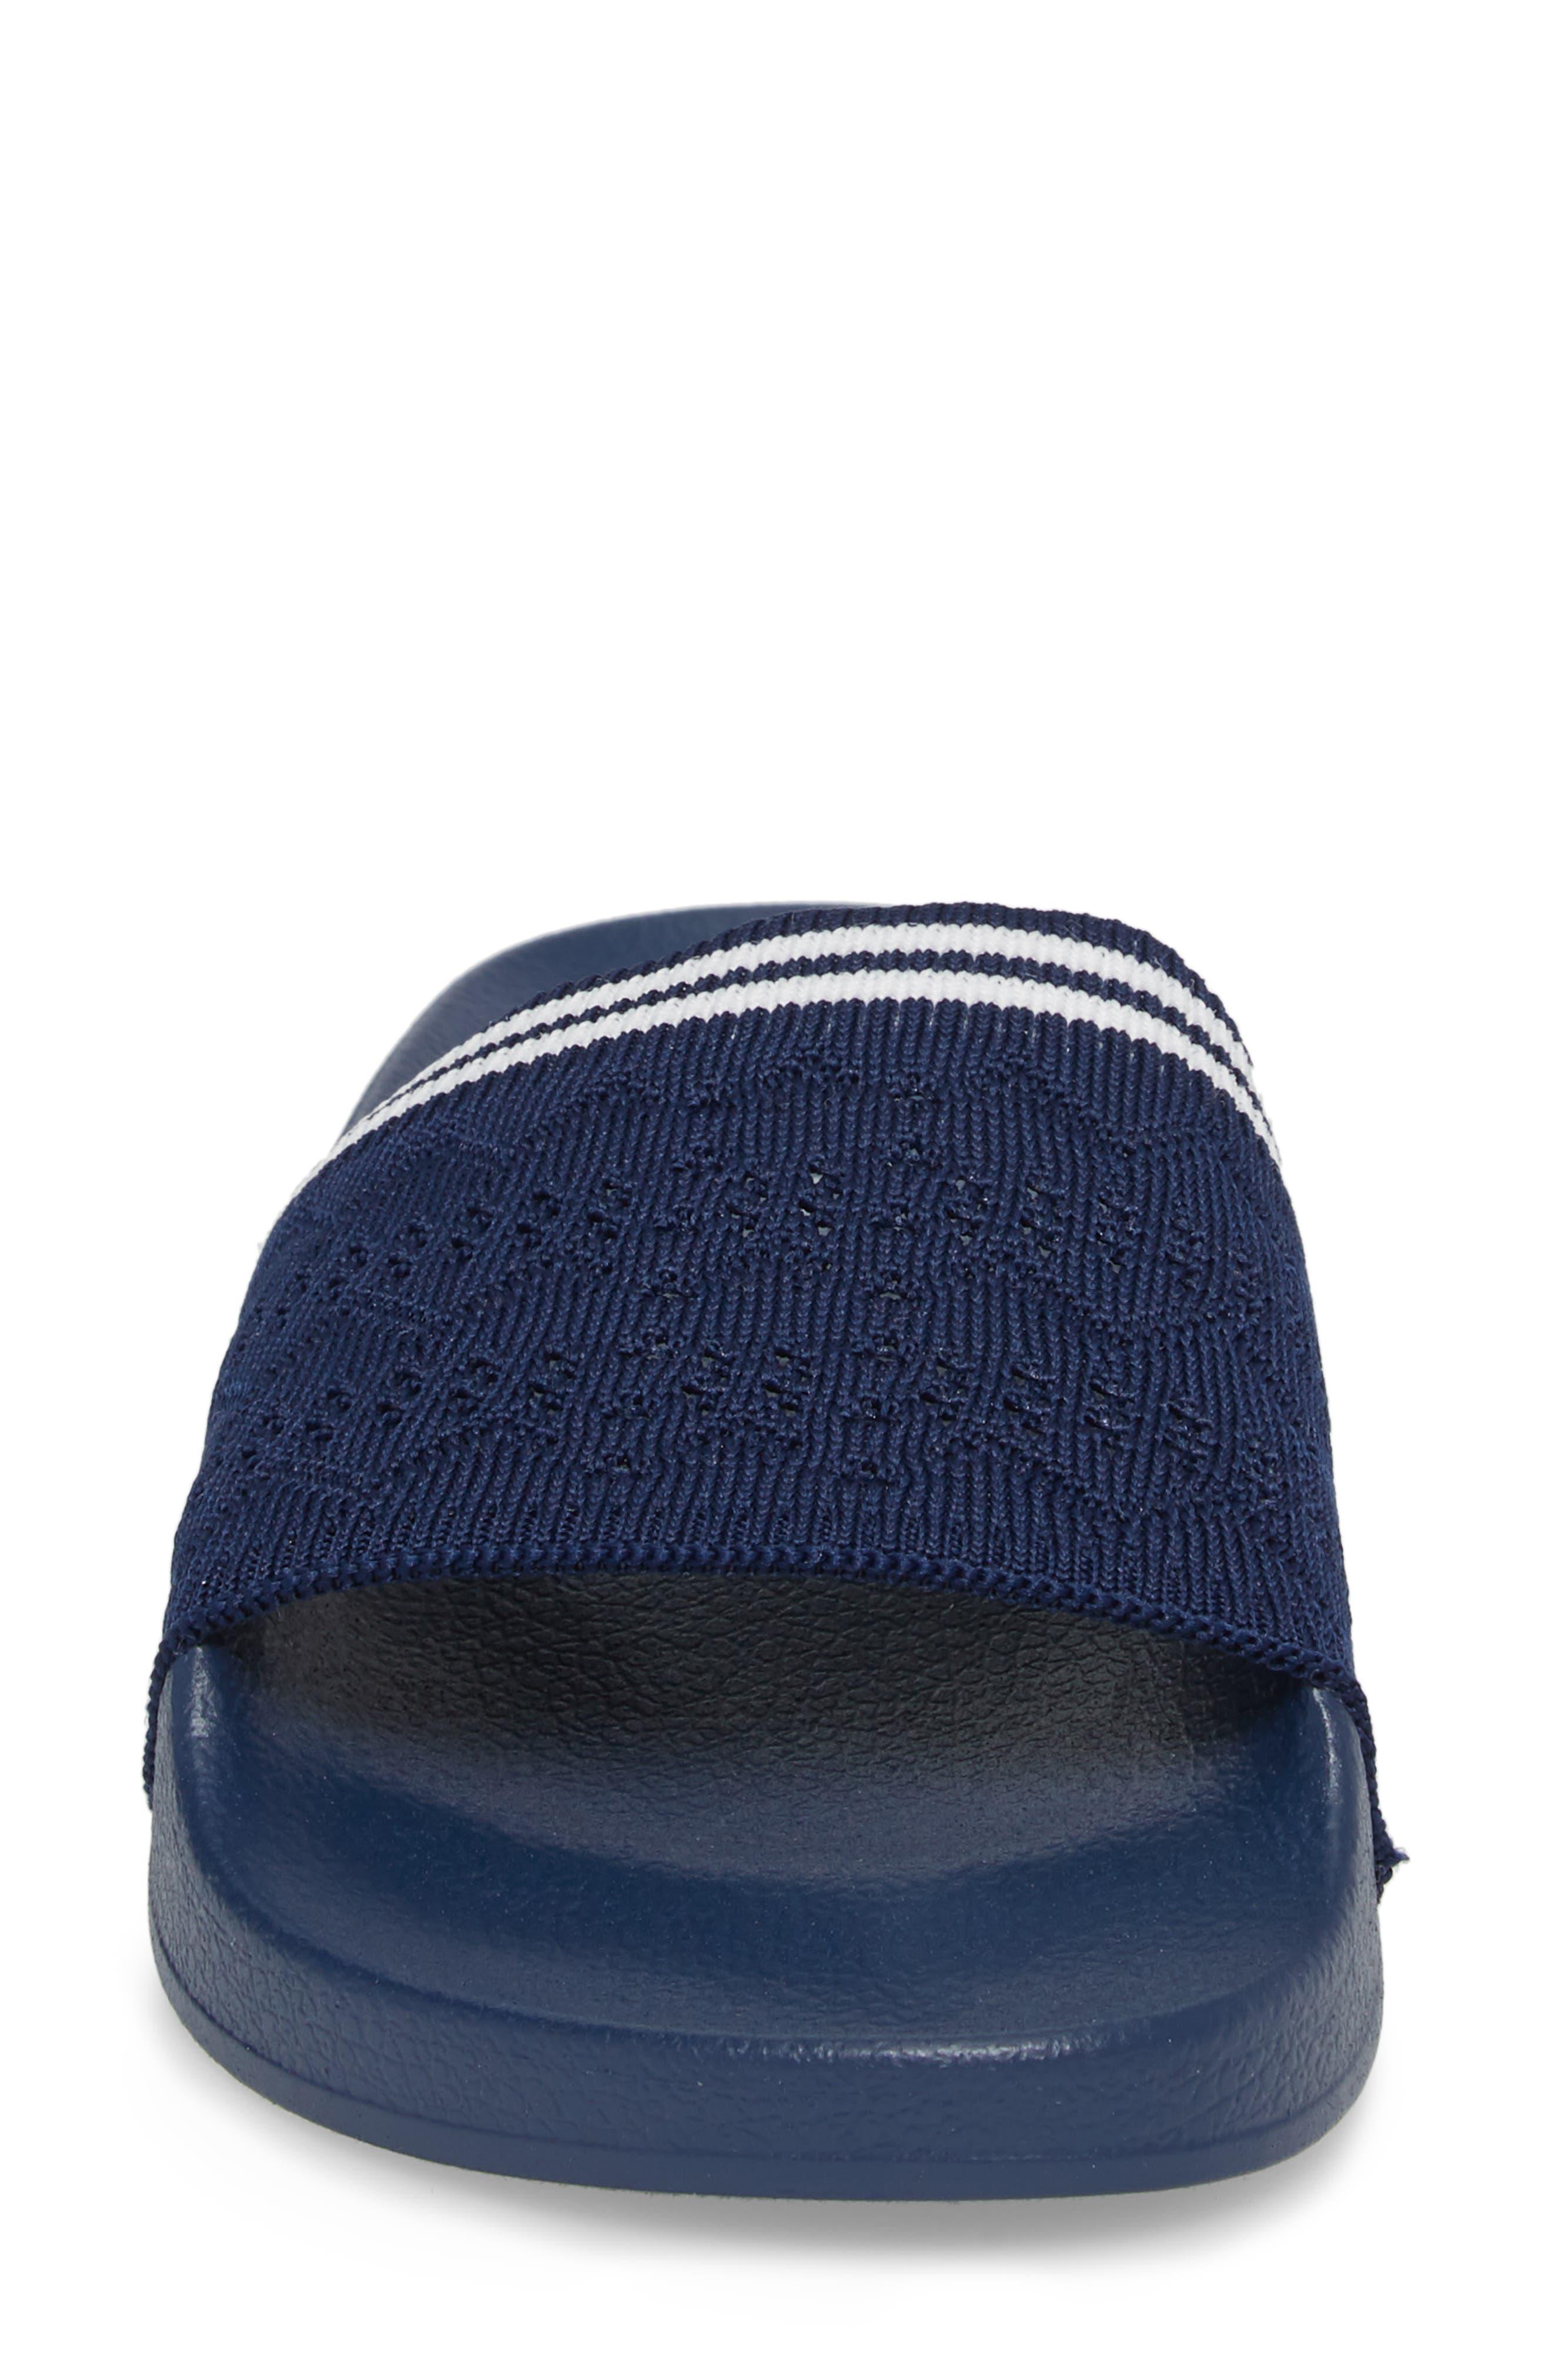 Vibe Sock Knit Slide Sandal,                             Alternate thumbnail 18, color,